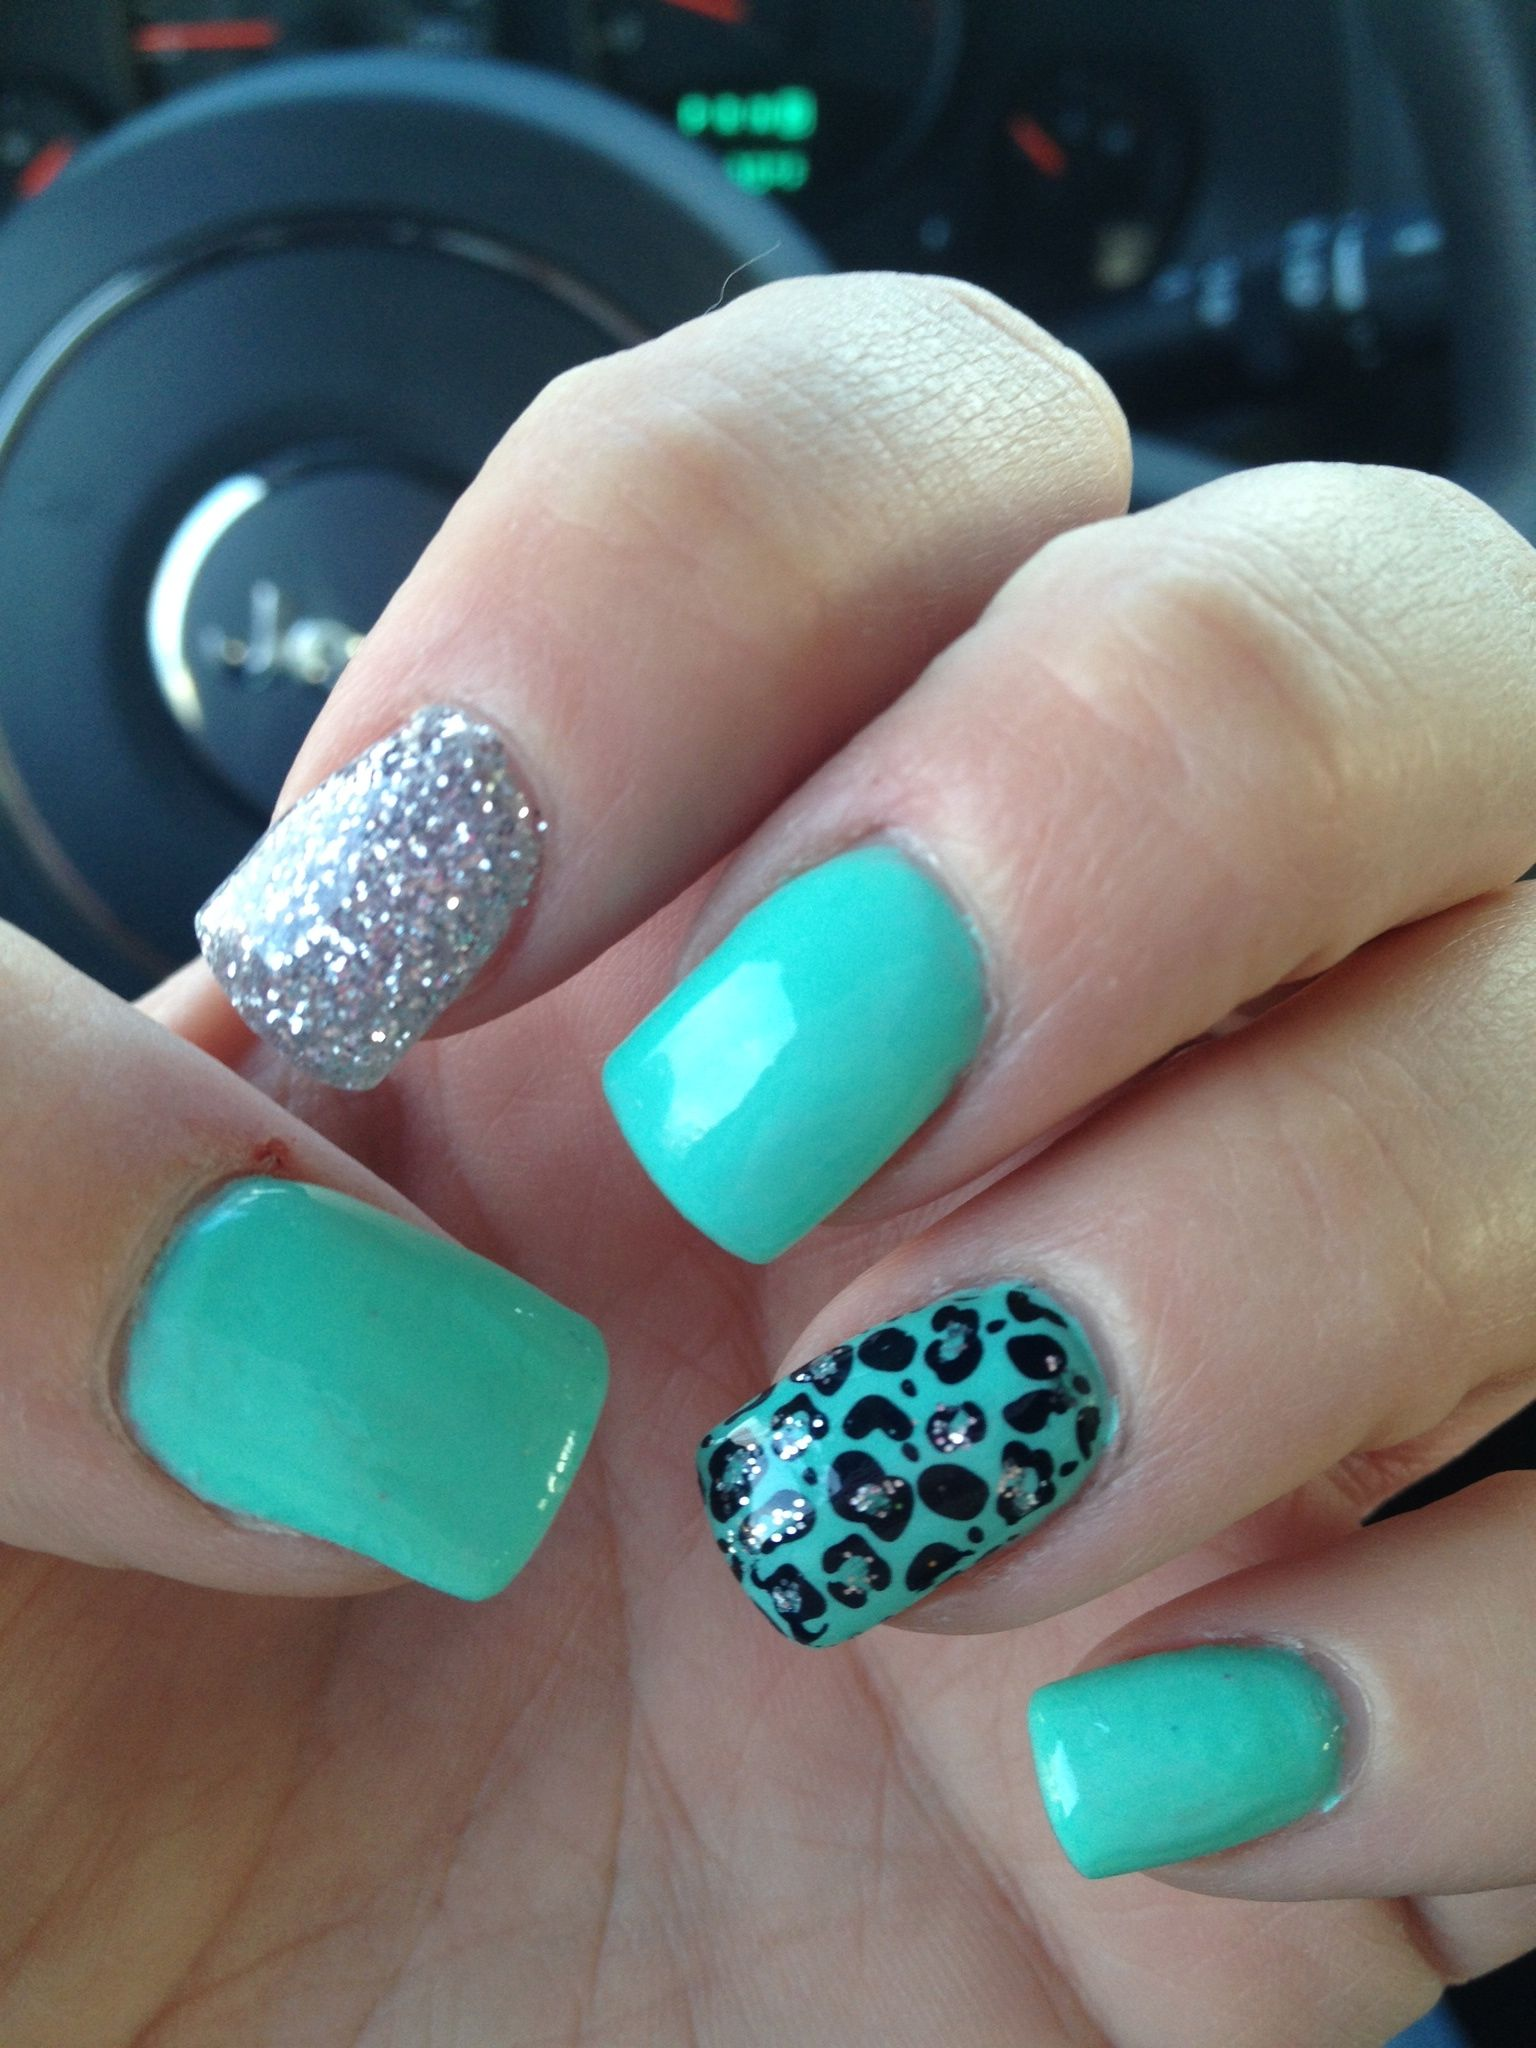 Gel Nails Mint Green With A Flare Nails Nail Polish Art Designs Gel Nails